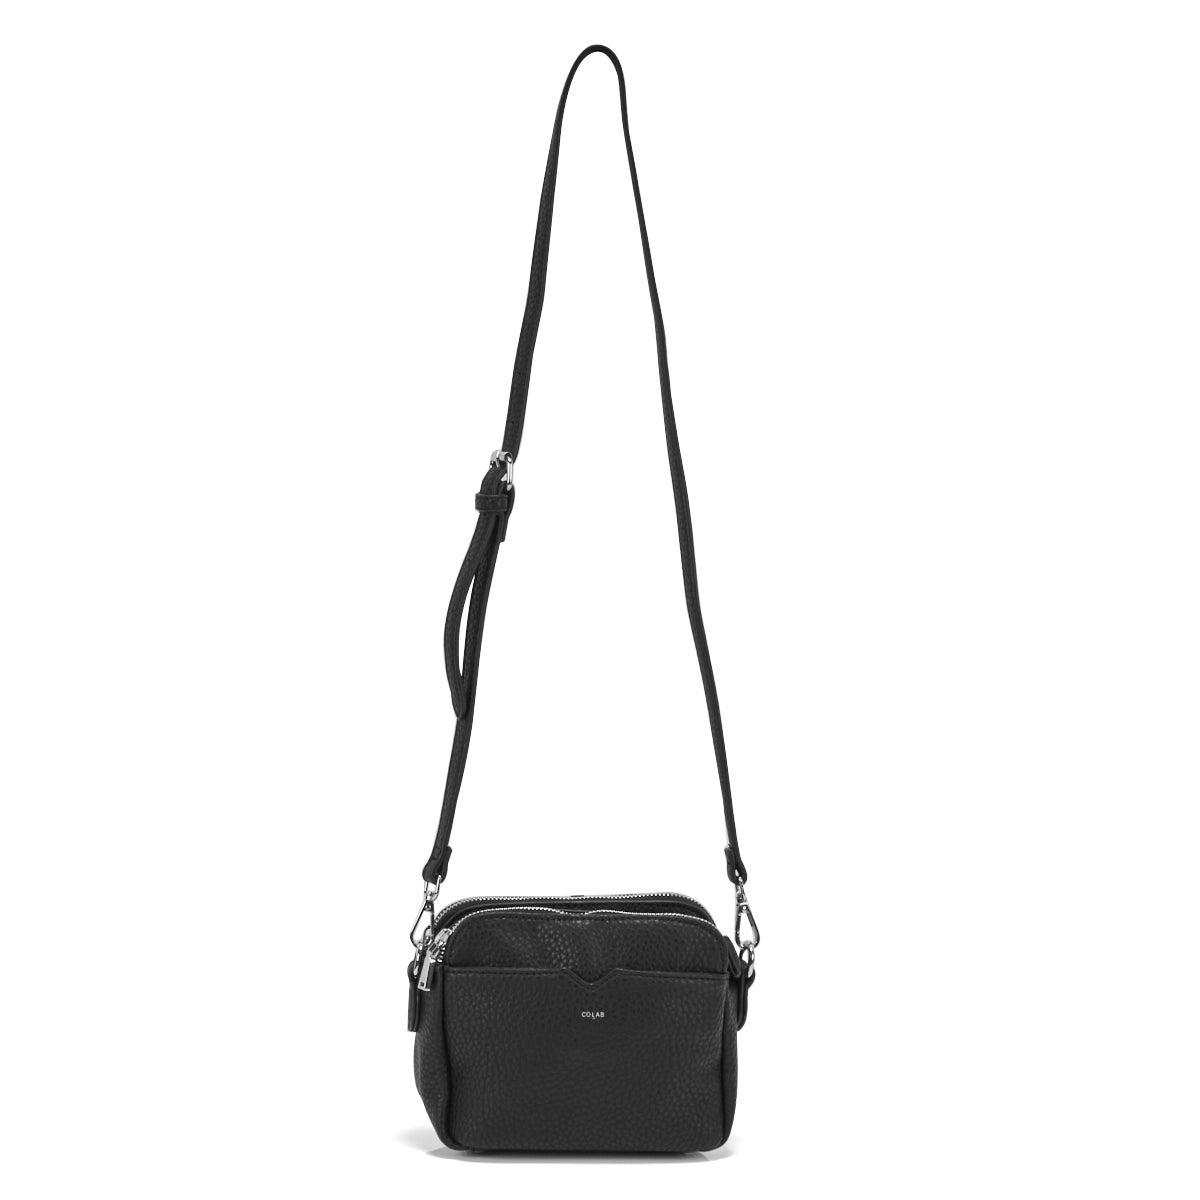 Lds black double crossbody bag